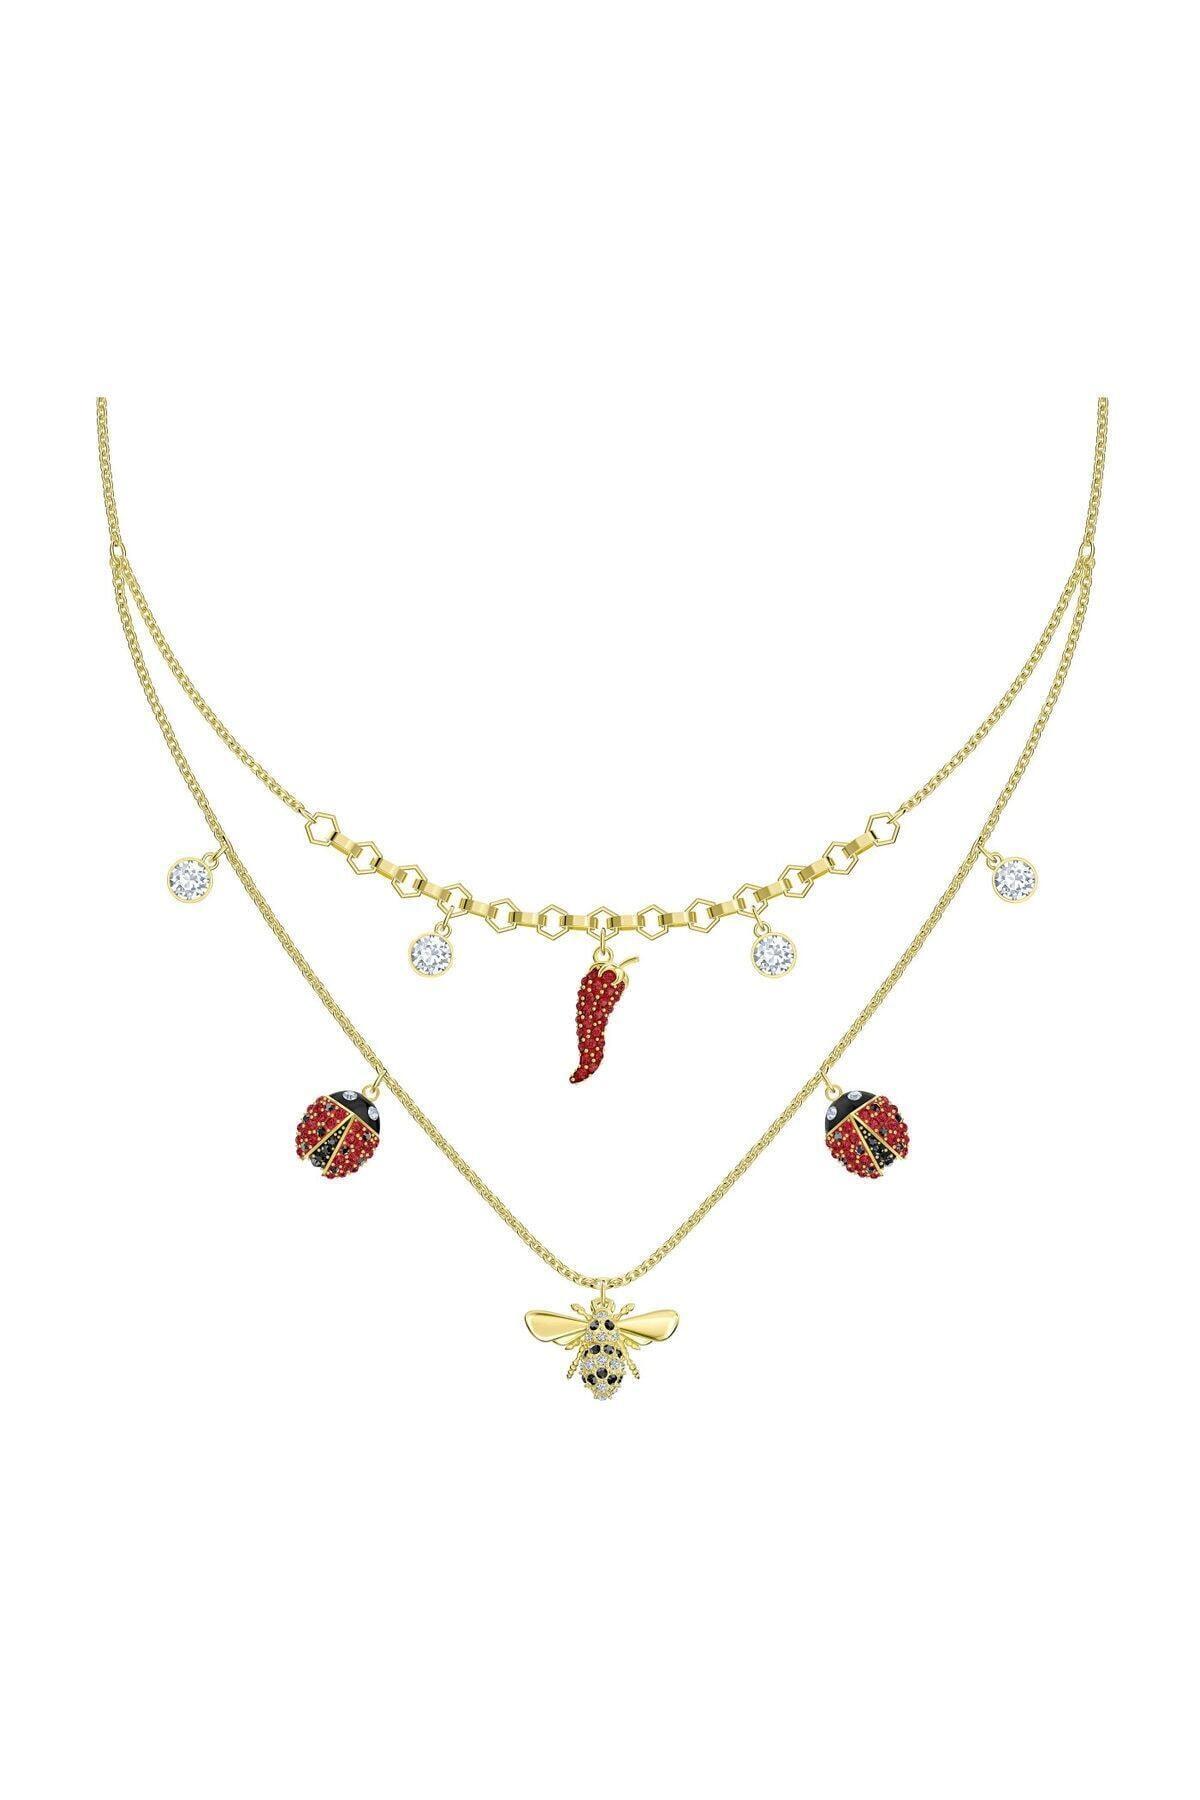 Swarovski Kolye Lisabel:Necklace Dmul/Gos 5498807 1